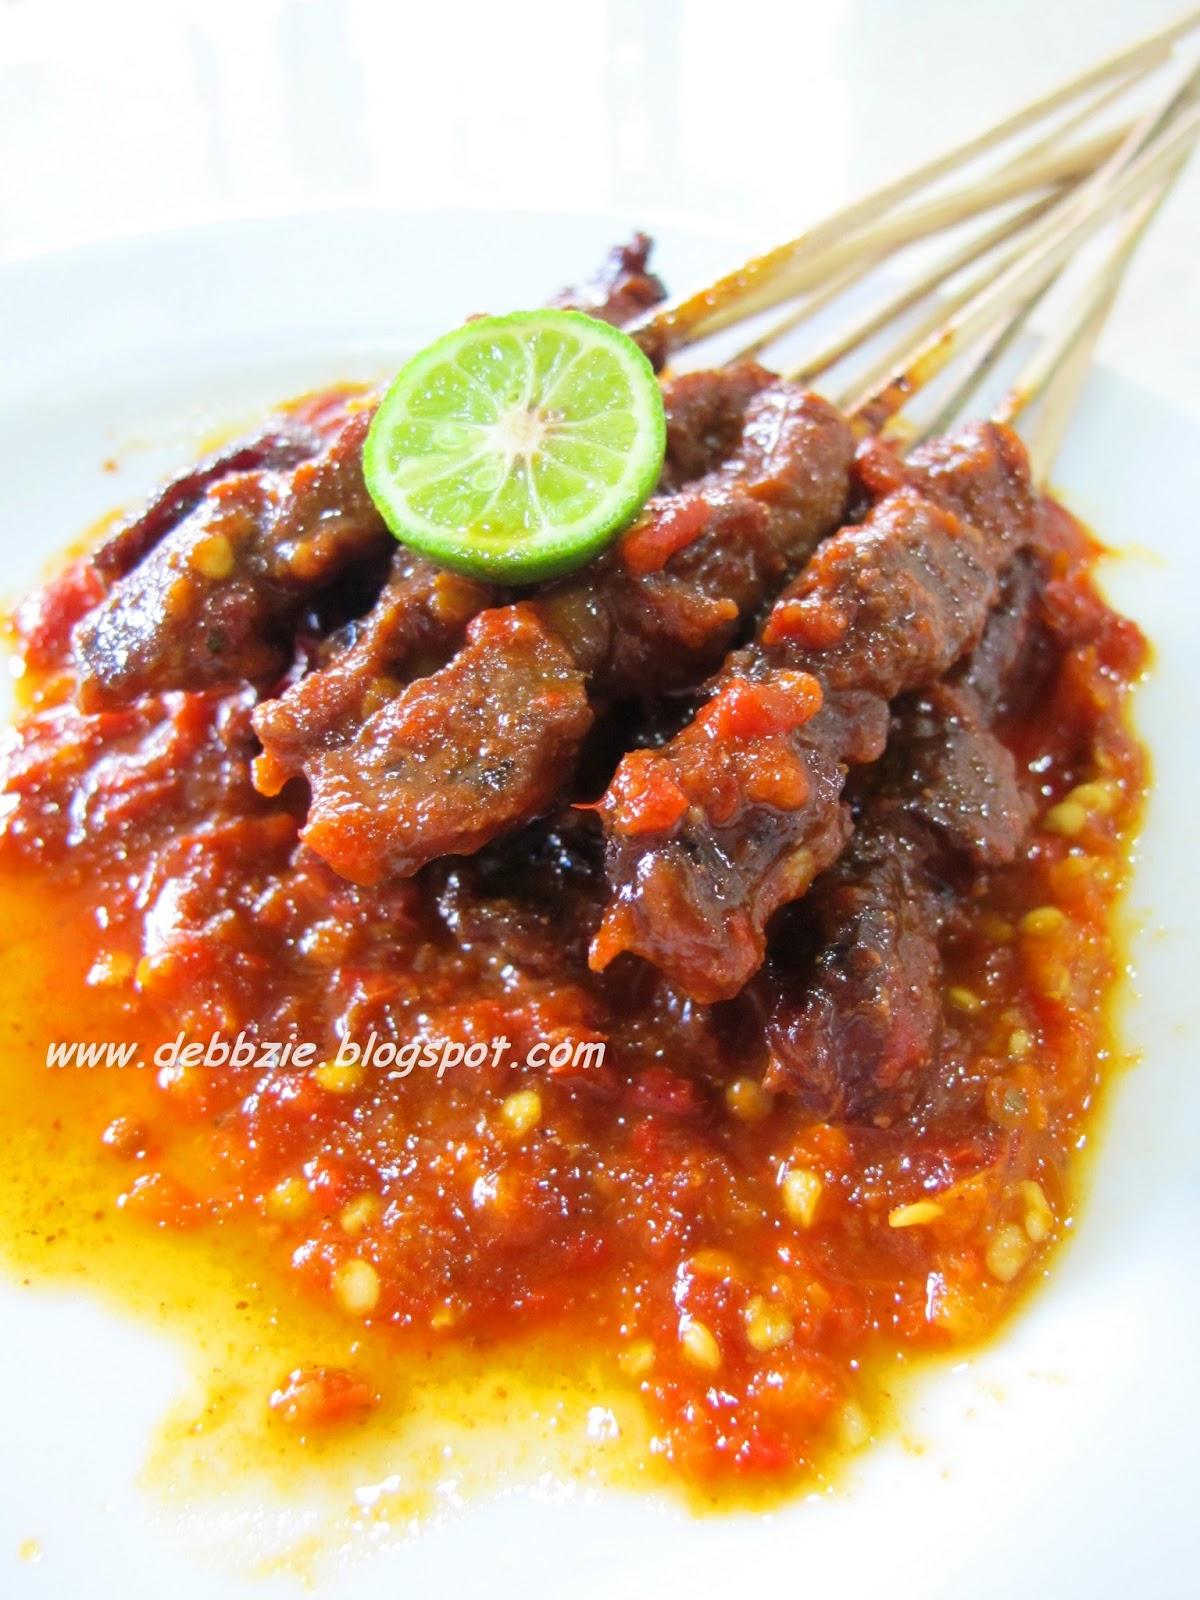 ... beef satay global table adventure beef satay beef sate indonesian beef